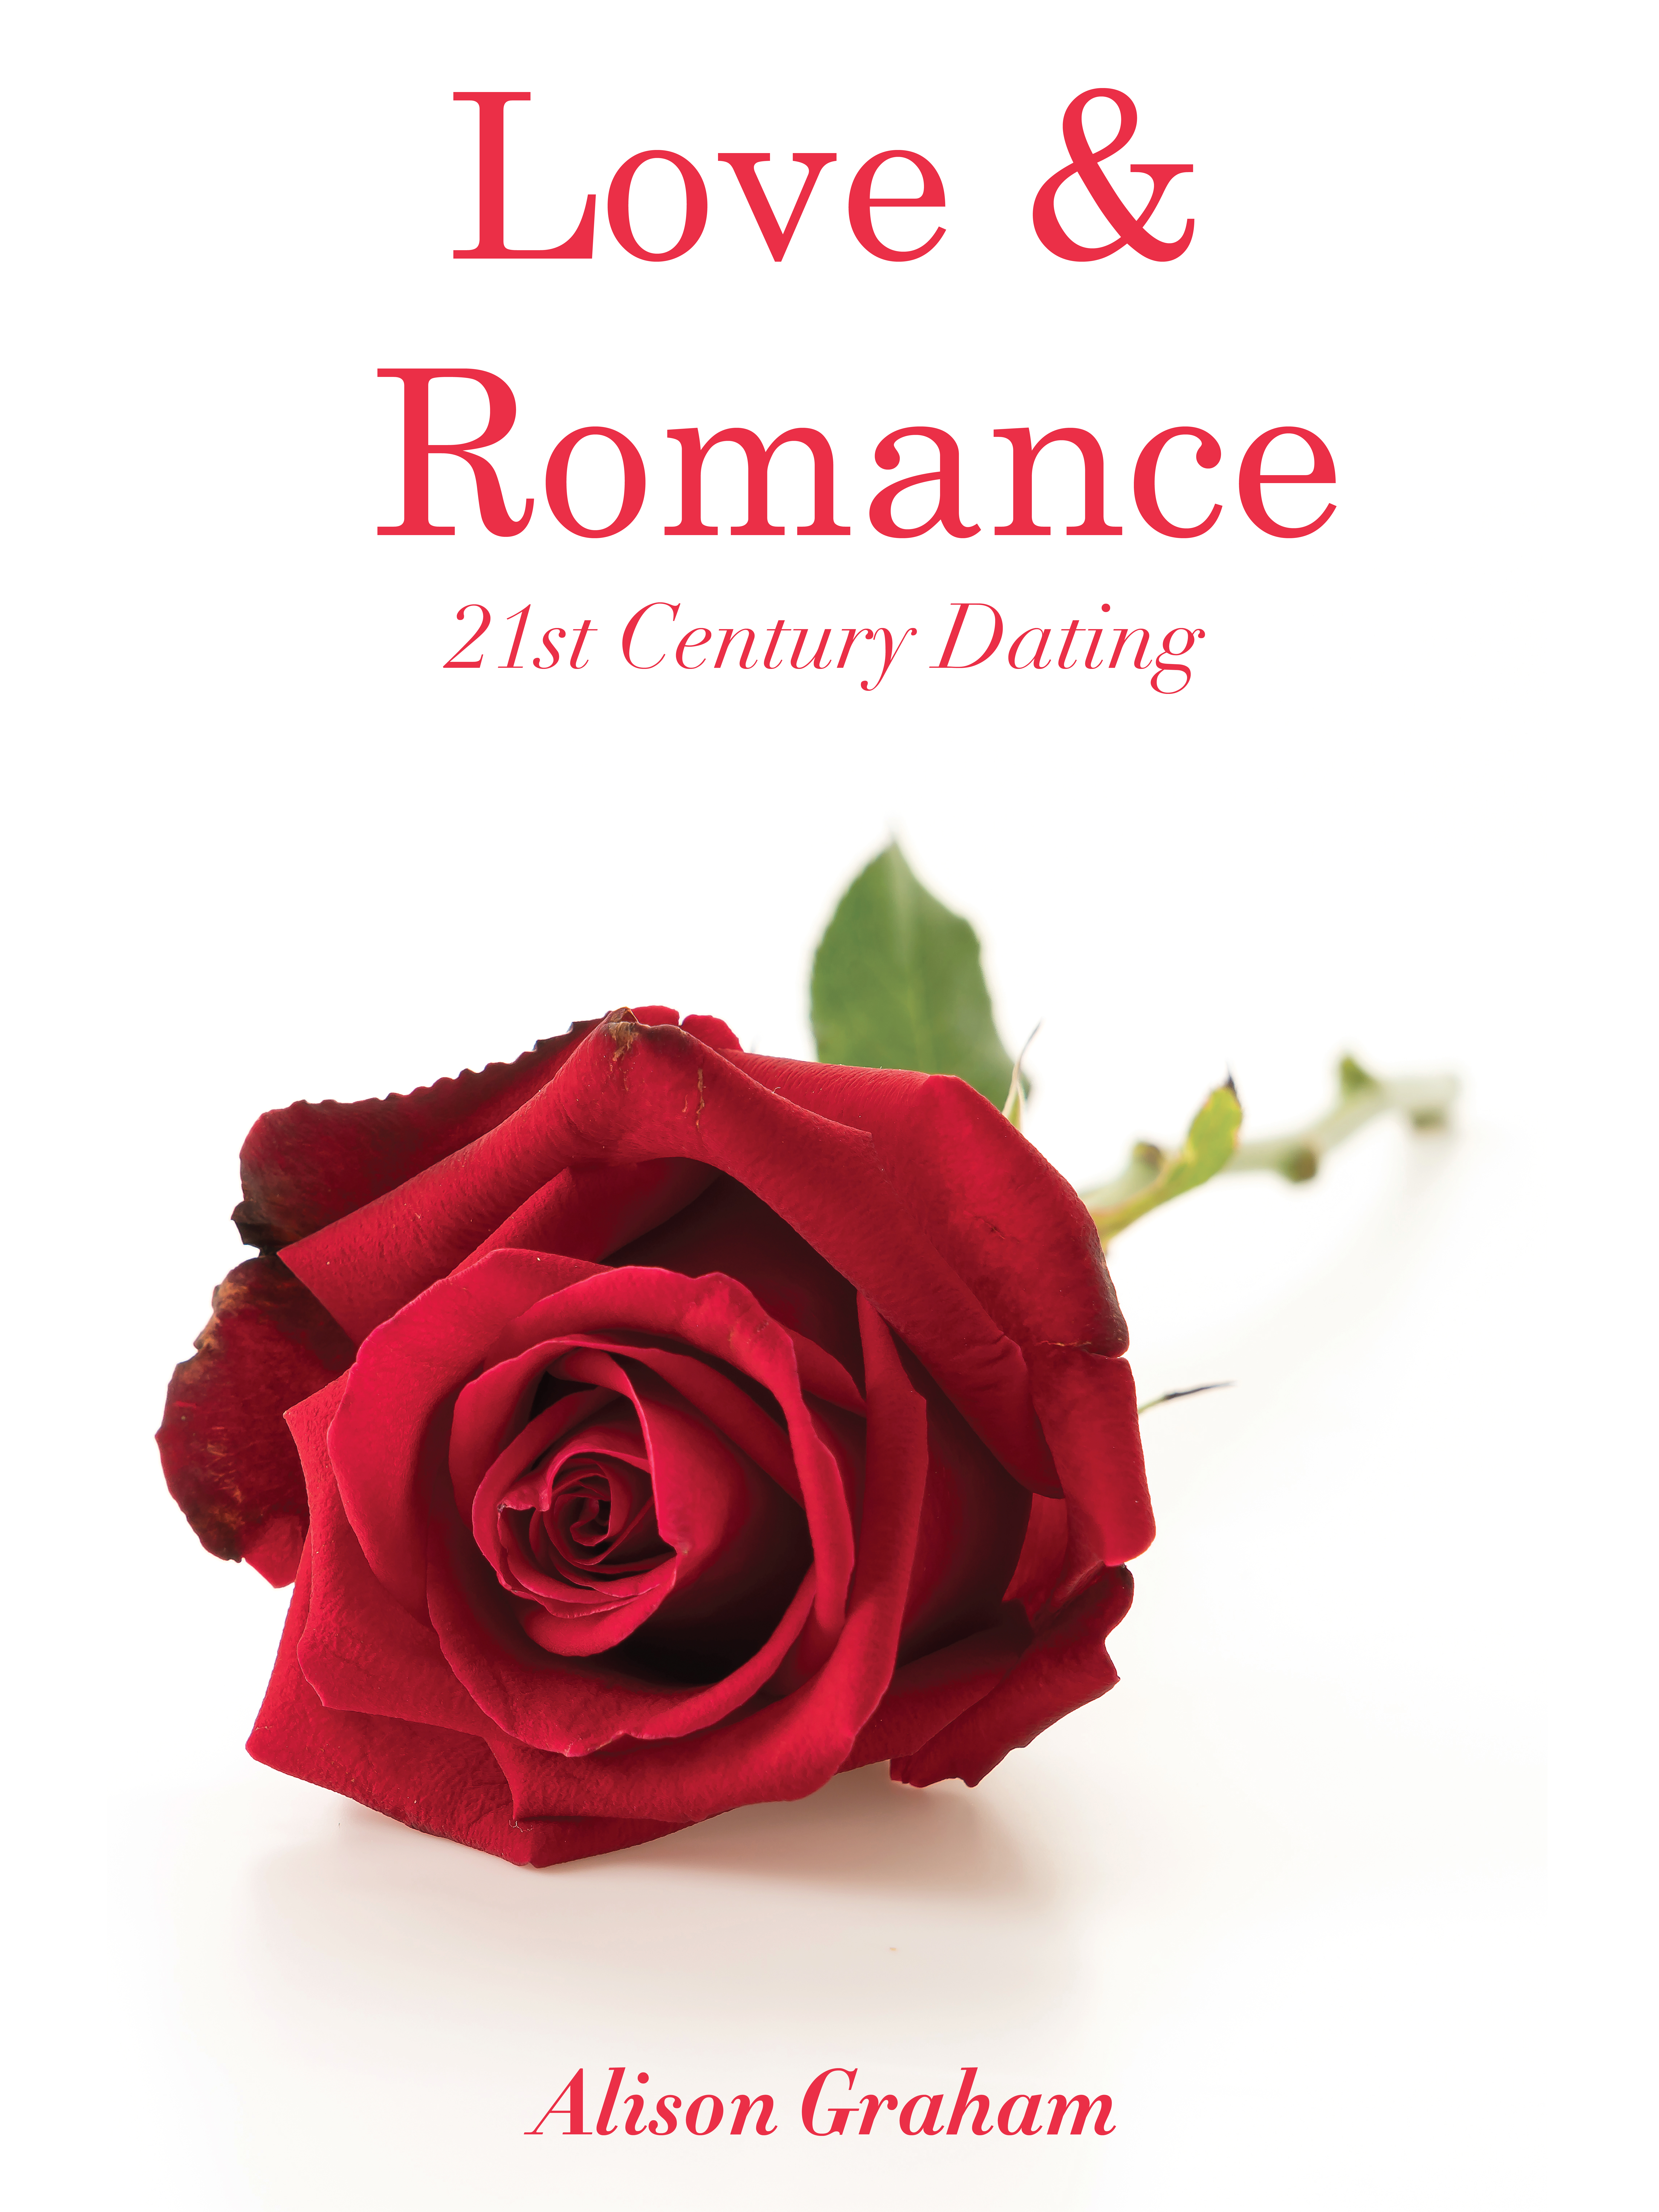 21st century dating